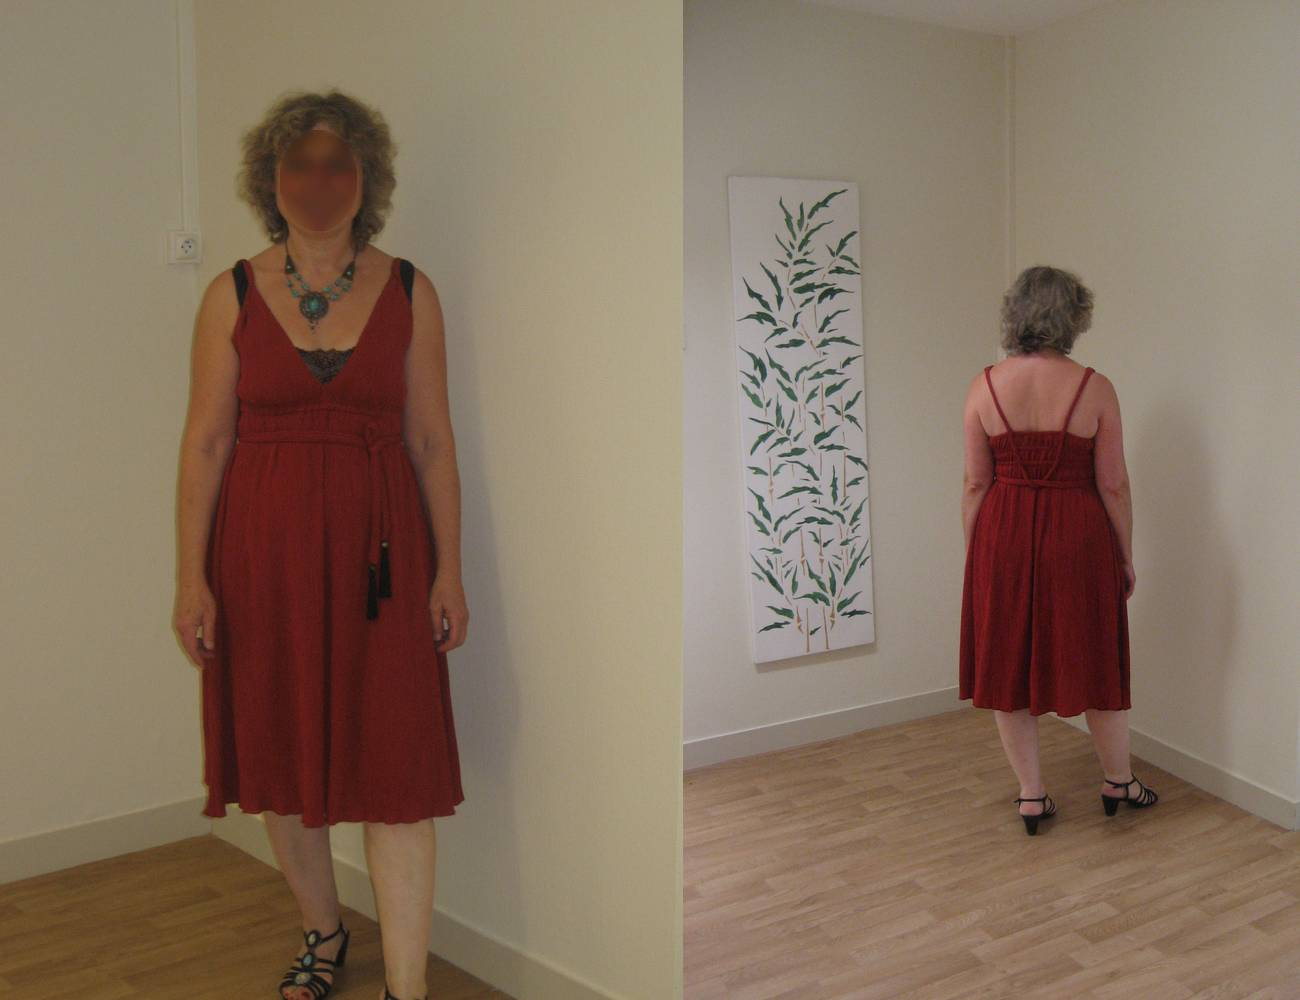 http://2.bp.blogspot.com/_nXrUdxZztOM/TJ17Z6tXLPI/AAAAAAAABNY/1zFFUka_ZIU/s1600/robe+rouge.jpg